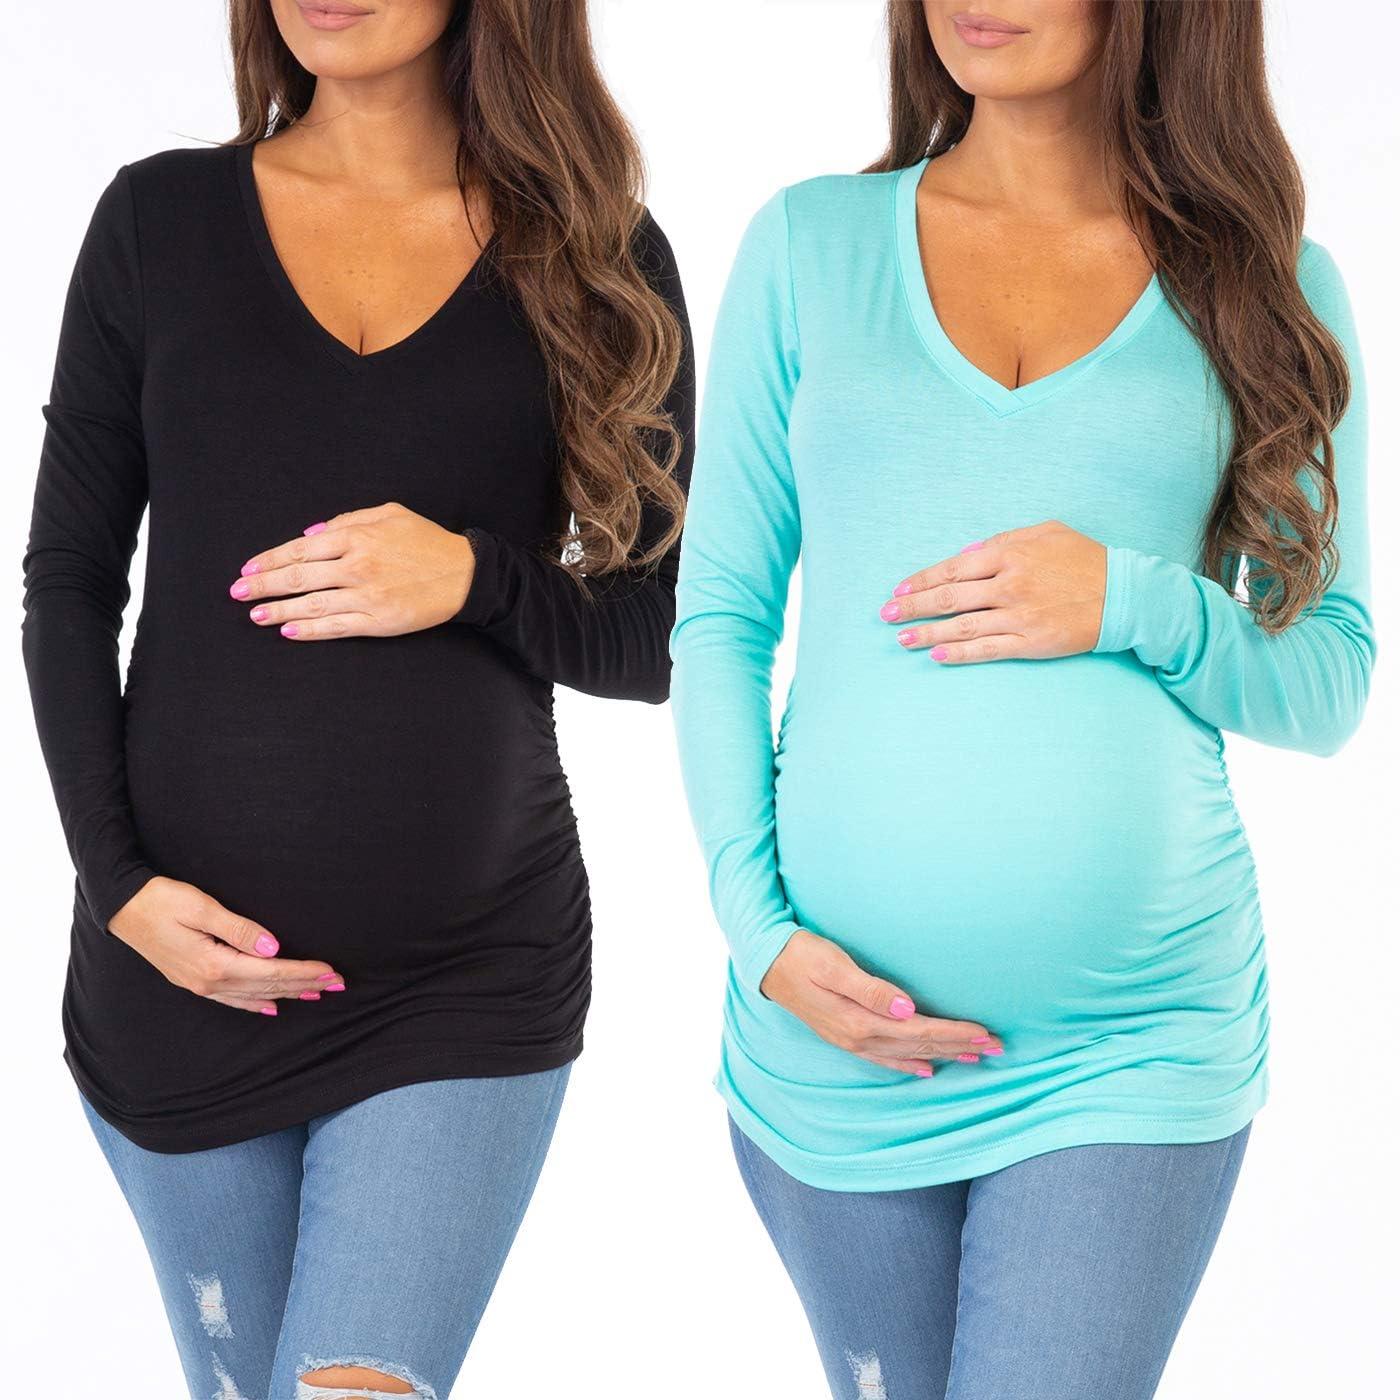 Ecavus Pack 3pcs Womens Maternity Tunic Tops Long Sleeve Flattering Side Ruched Pregnancy Shirt